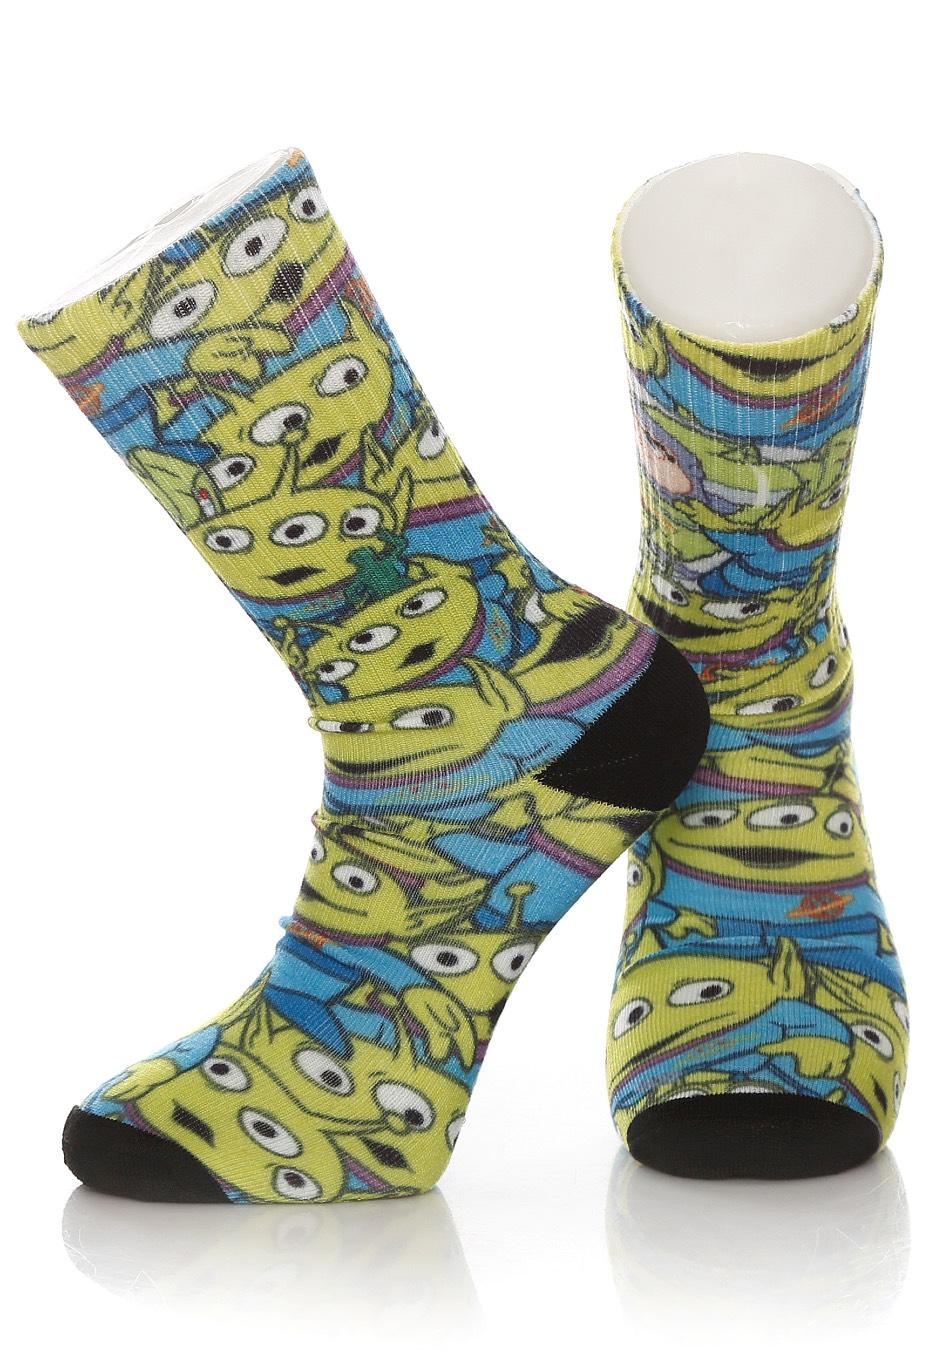 Vans X Toy Story - Vans C Aliens - Socks - Impericon.com UK e8ad8dd3d